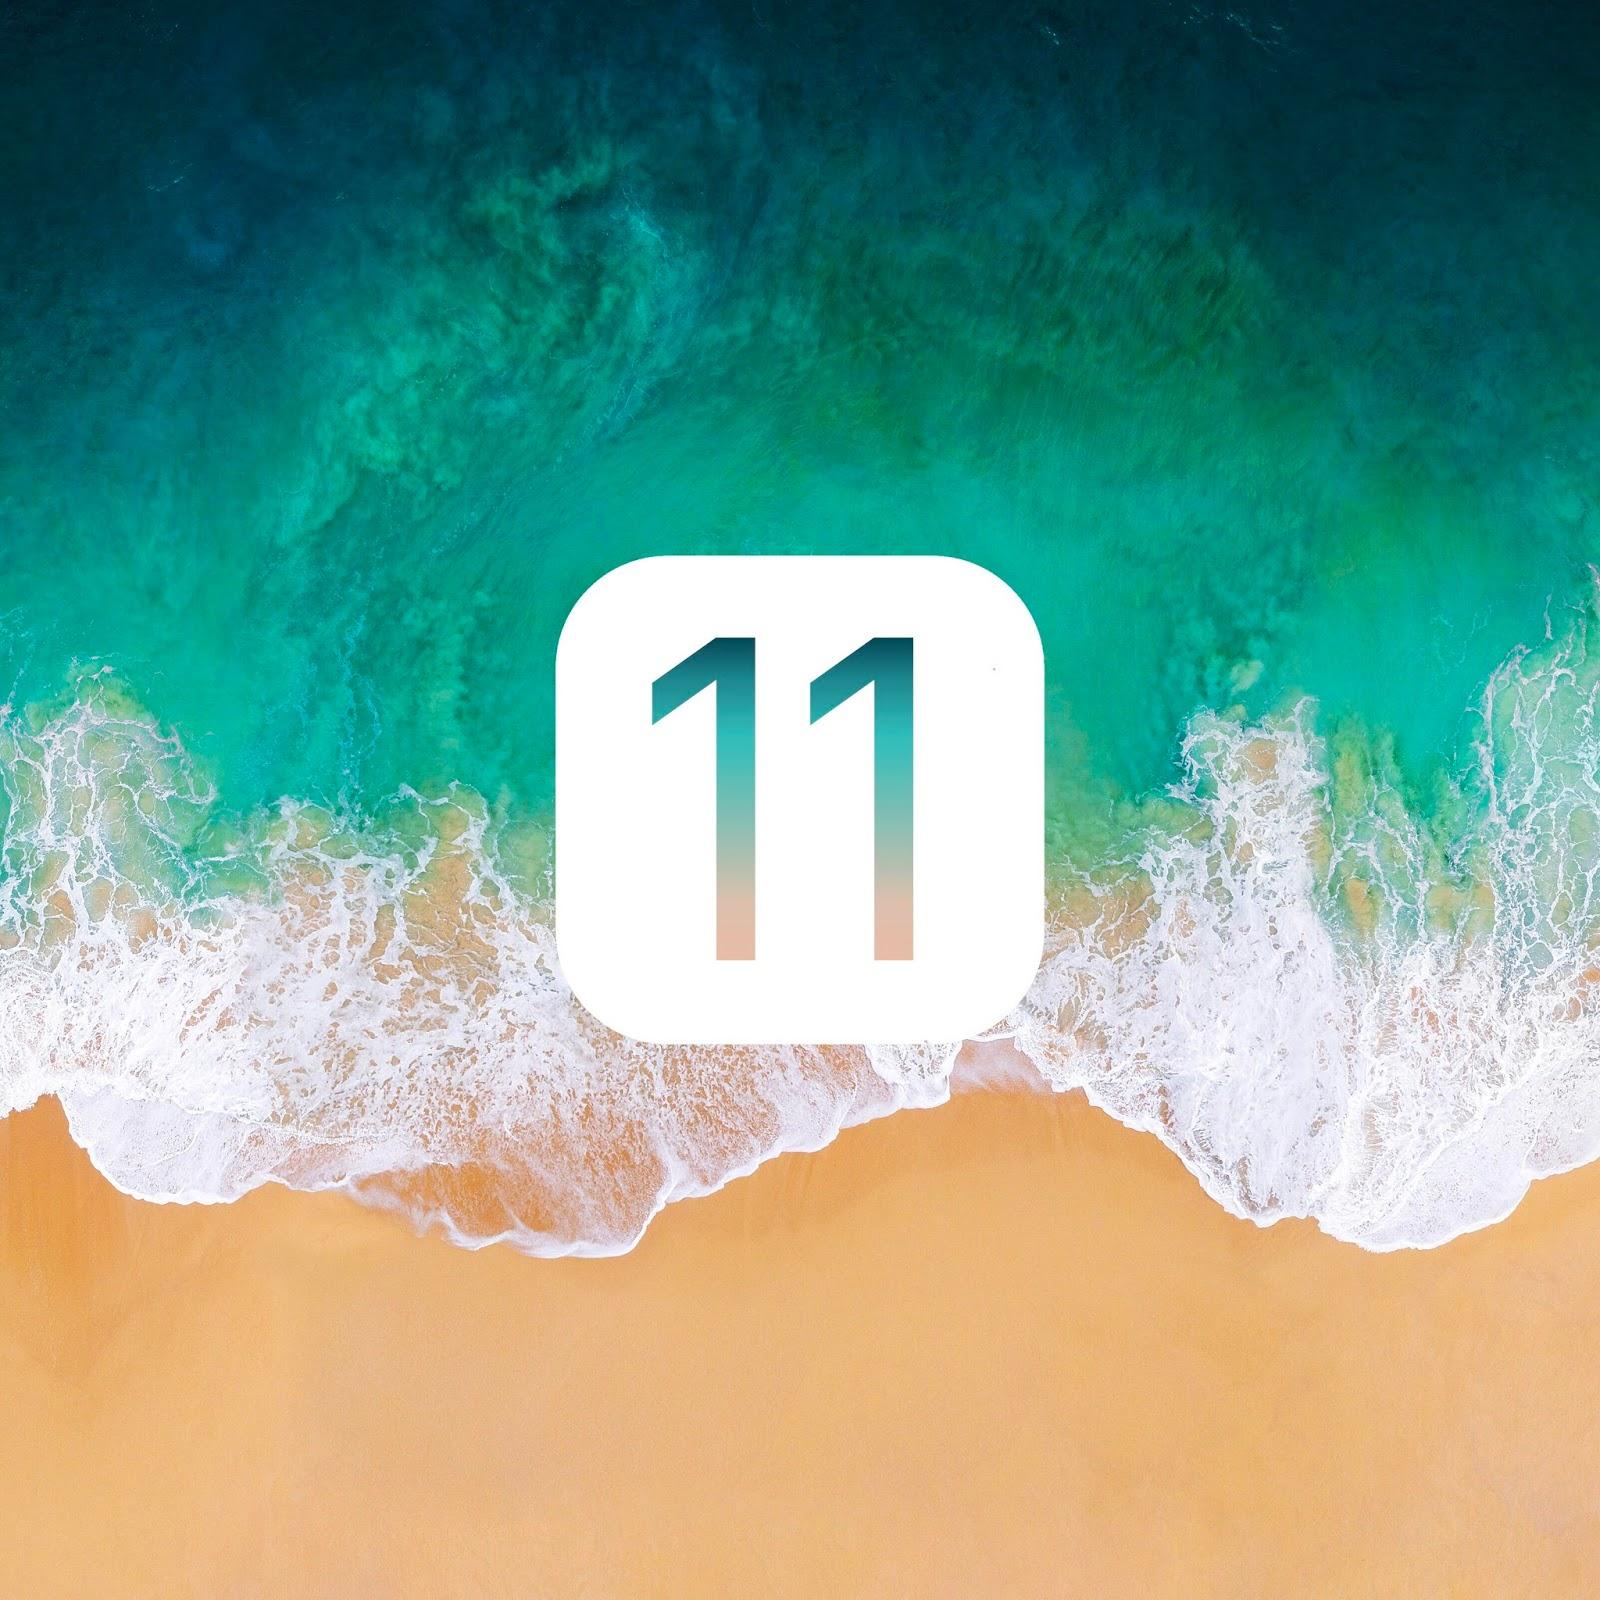 Download iOS 11 Wallpaper iPhone / iPad HD resolution